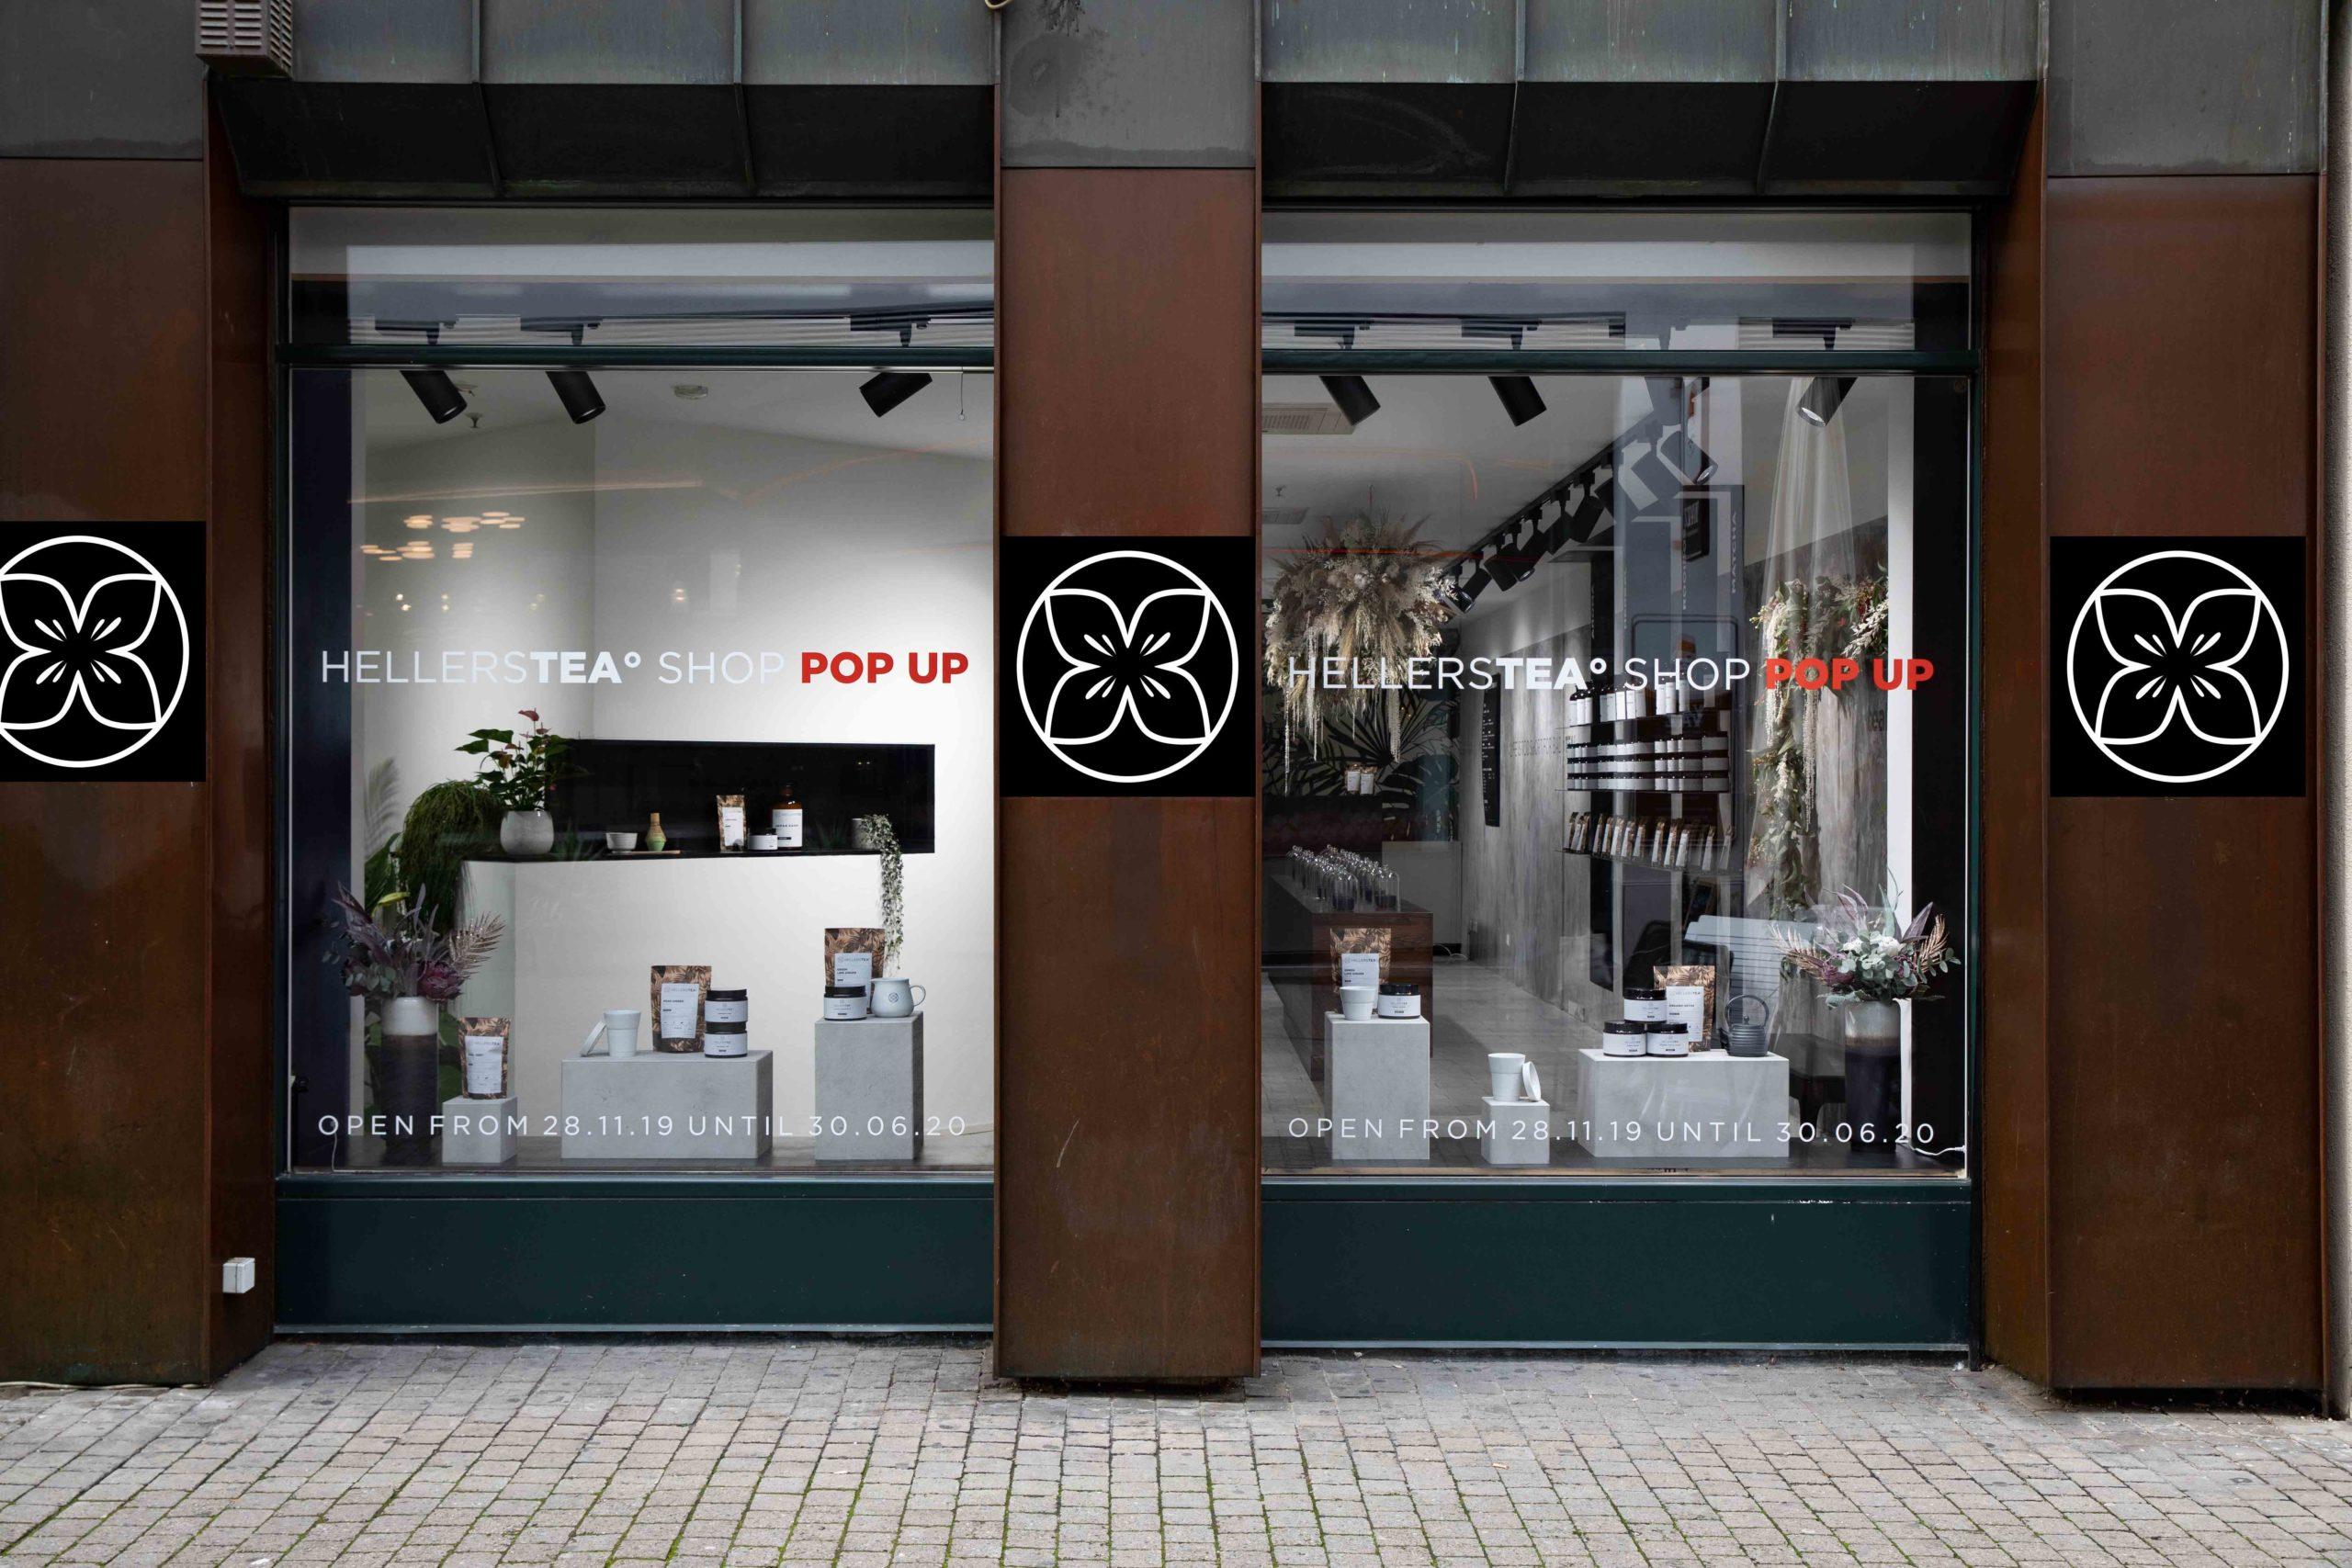 Hellers Tea Shop Pop Up Nobla Innengestaltung Innenarchitektur